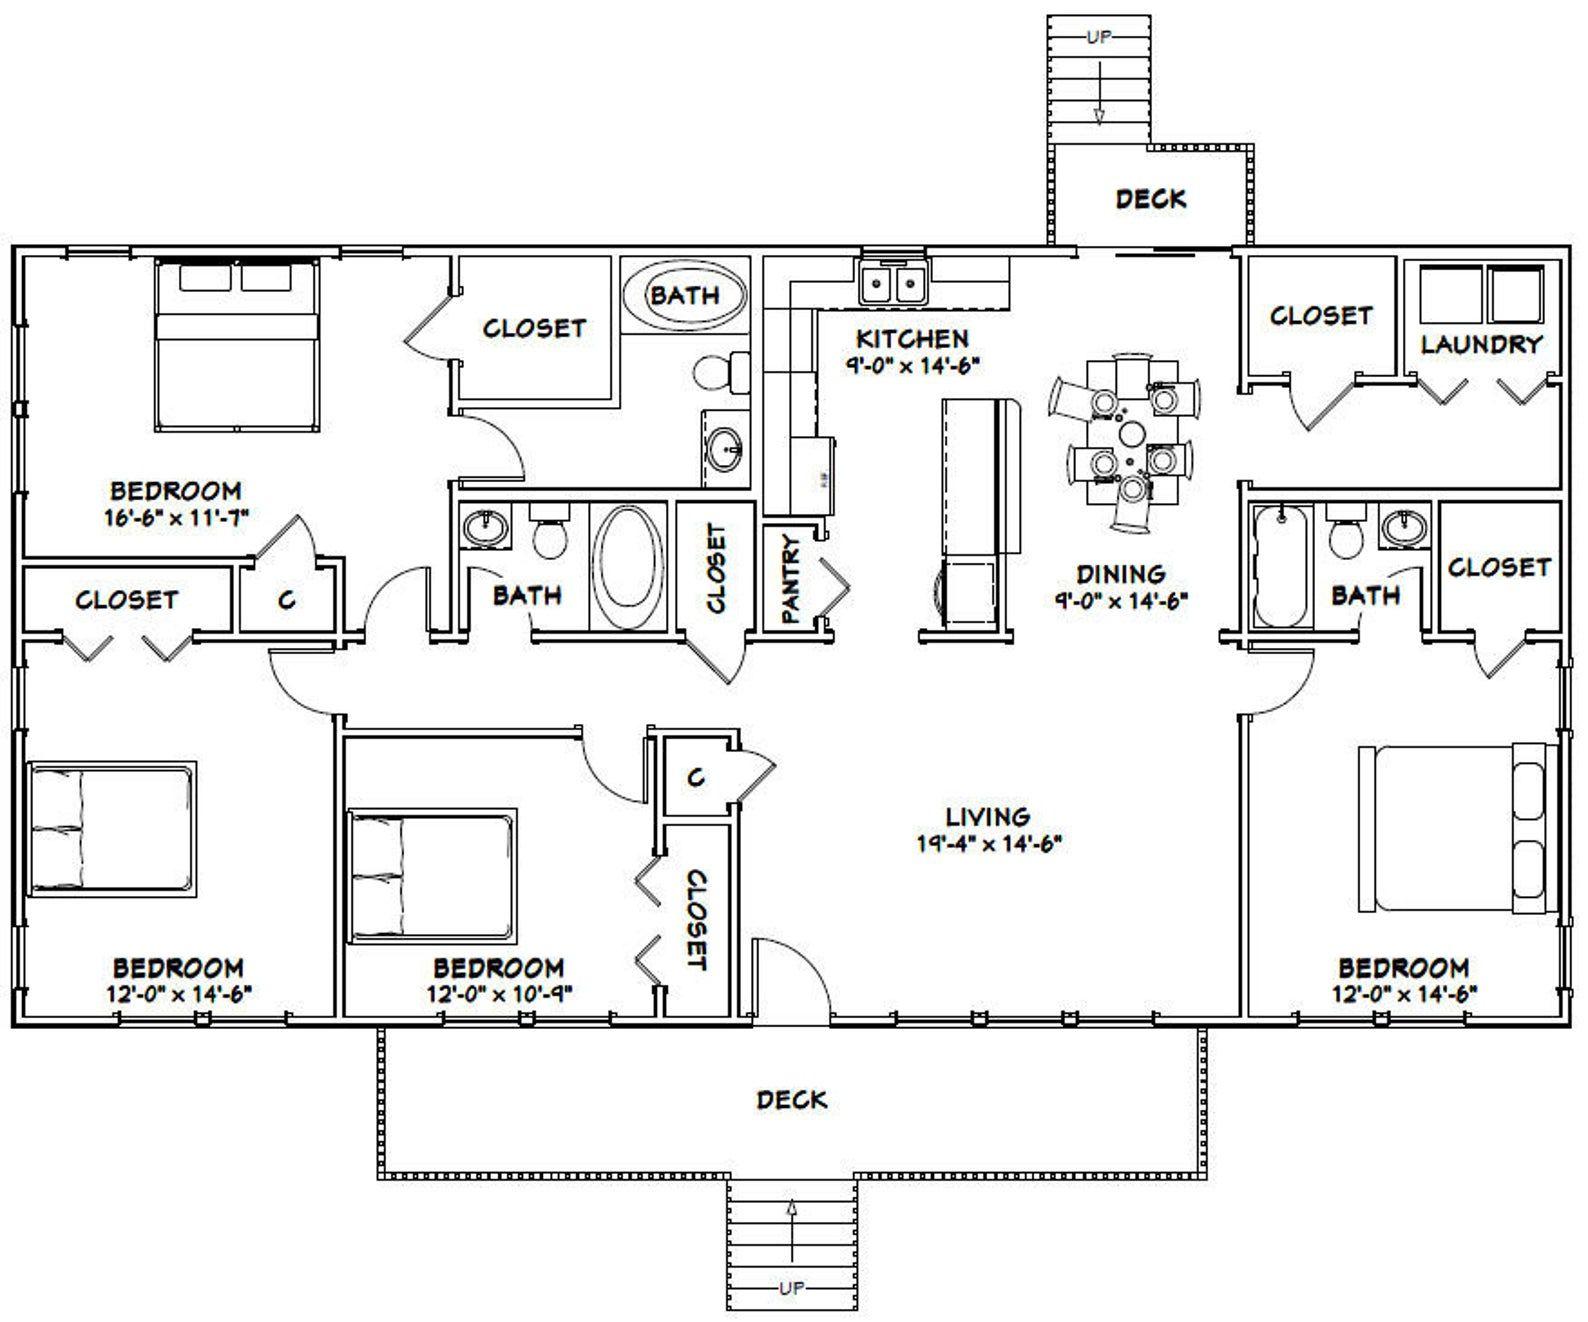 60x30 House 4 Bedroom 3 Bath 1800 Sq Ft Pdf Floor Etsy Barndominium Floor Plans Rectangle House Plans Mobile Home Floor Plans